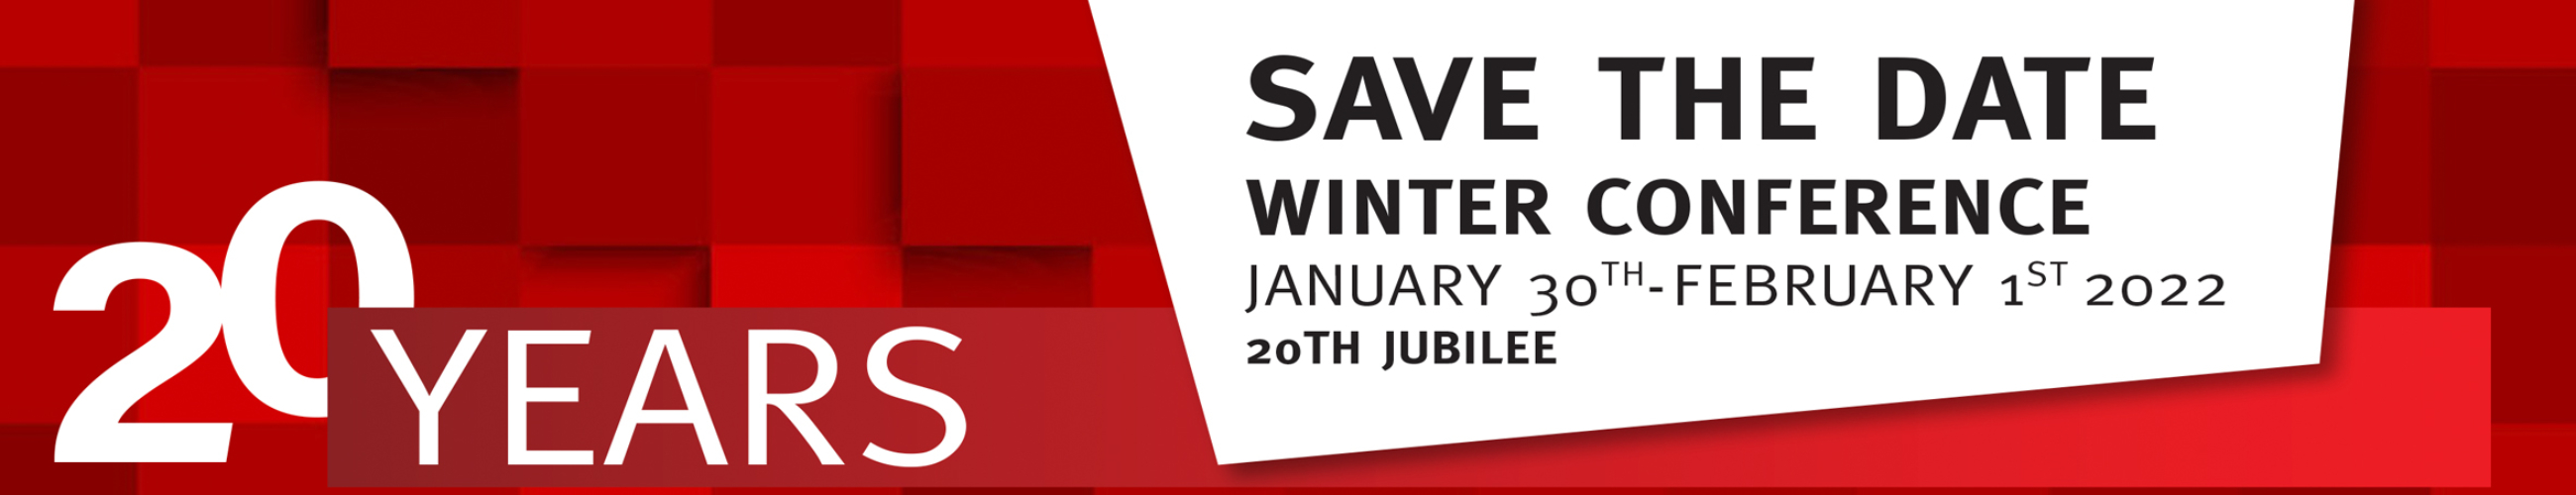 Slider FRONT PAGE 2021 Conference website new